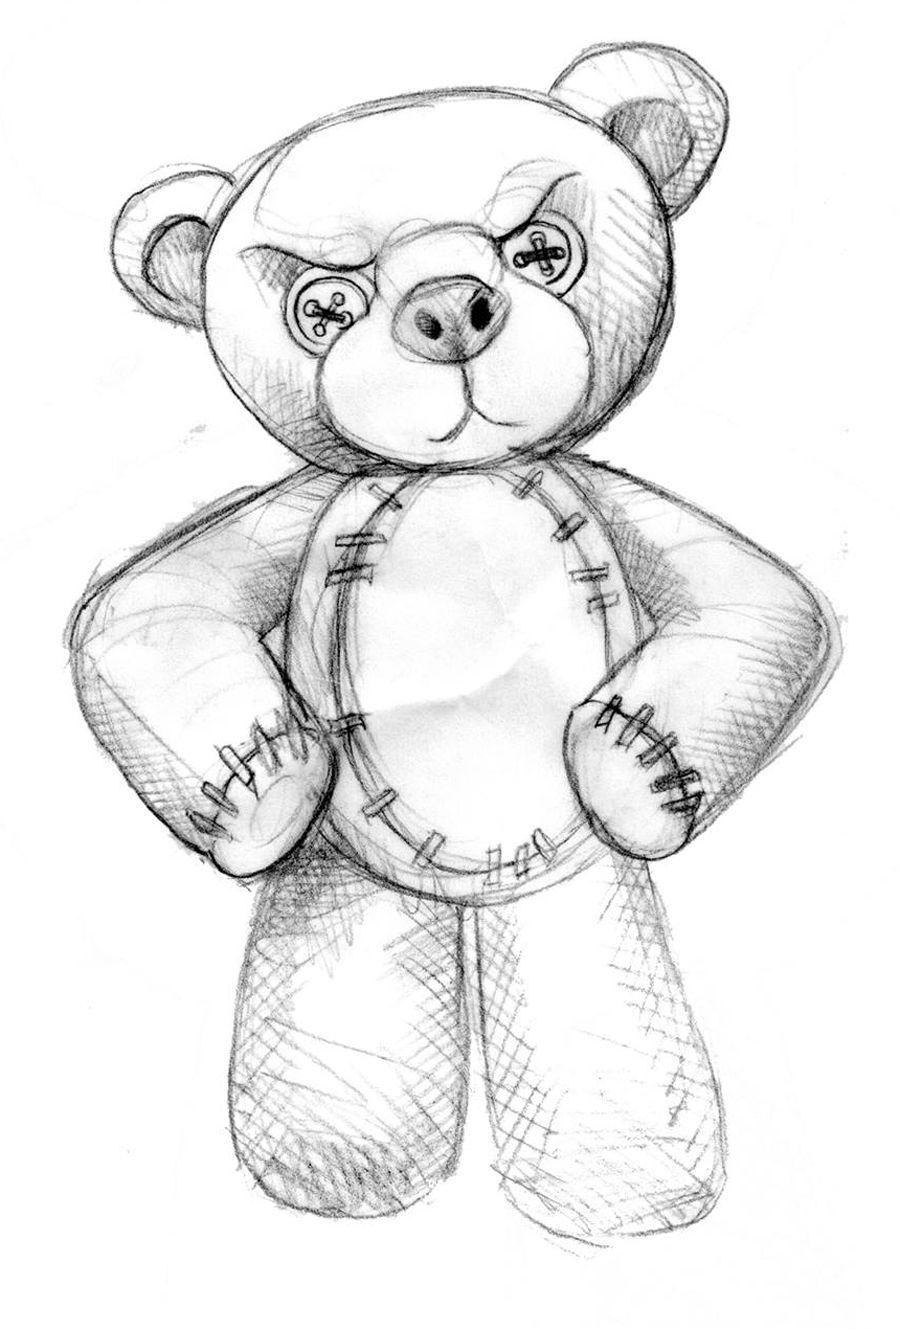 teddybear sketch My name is jason doherty I am a